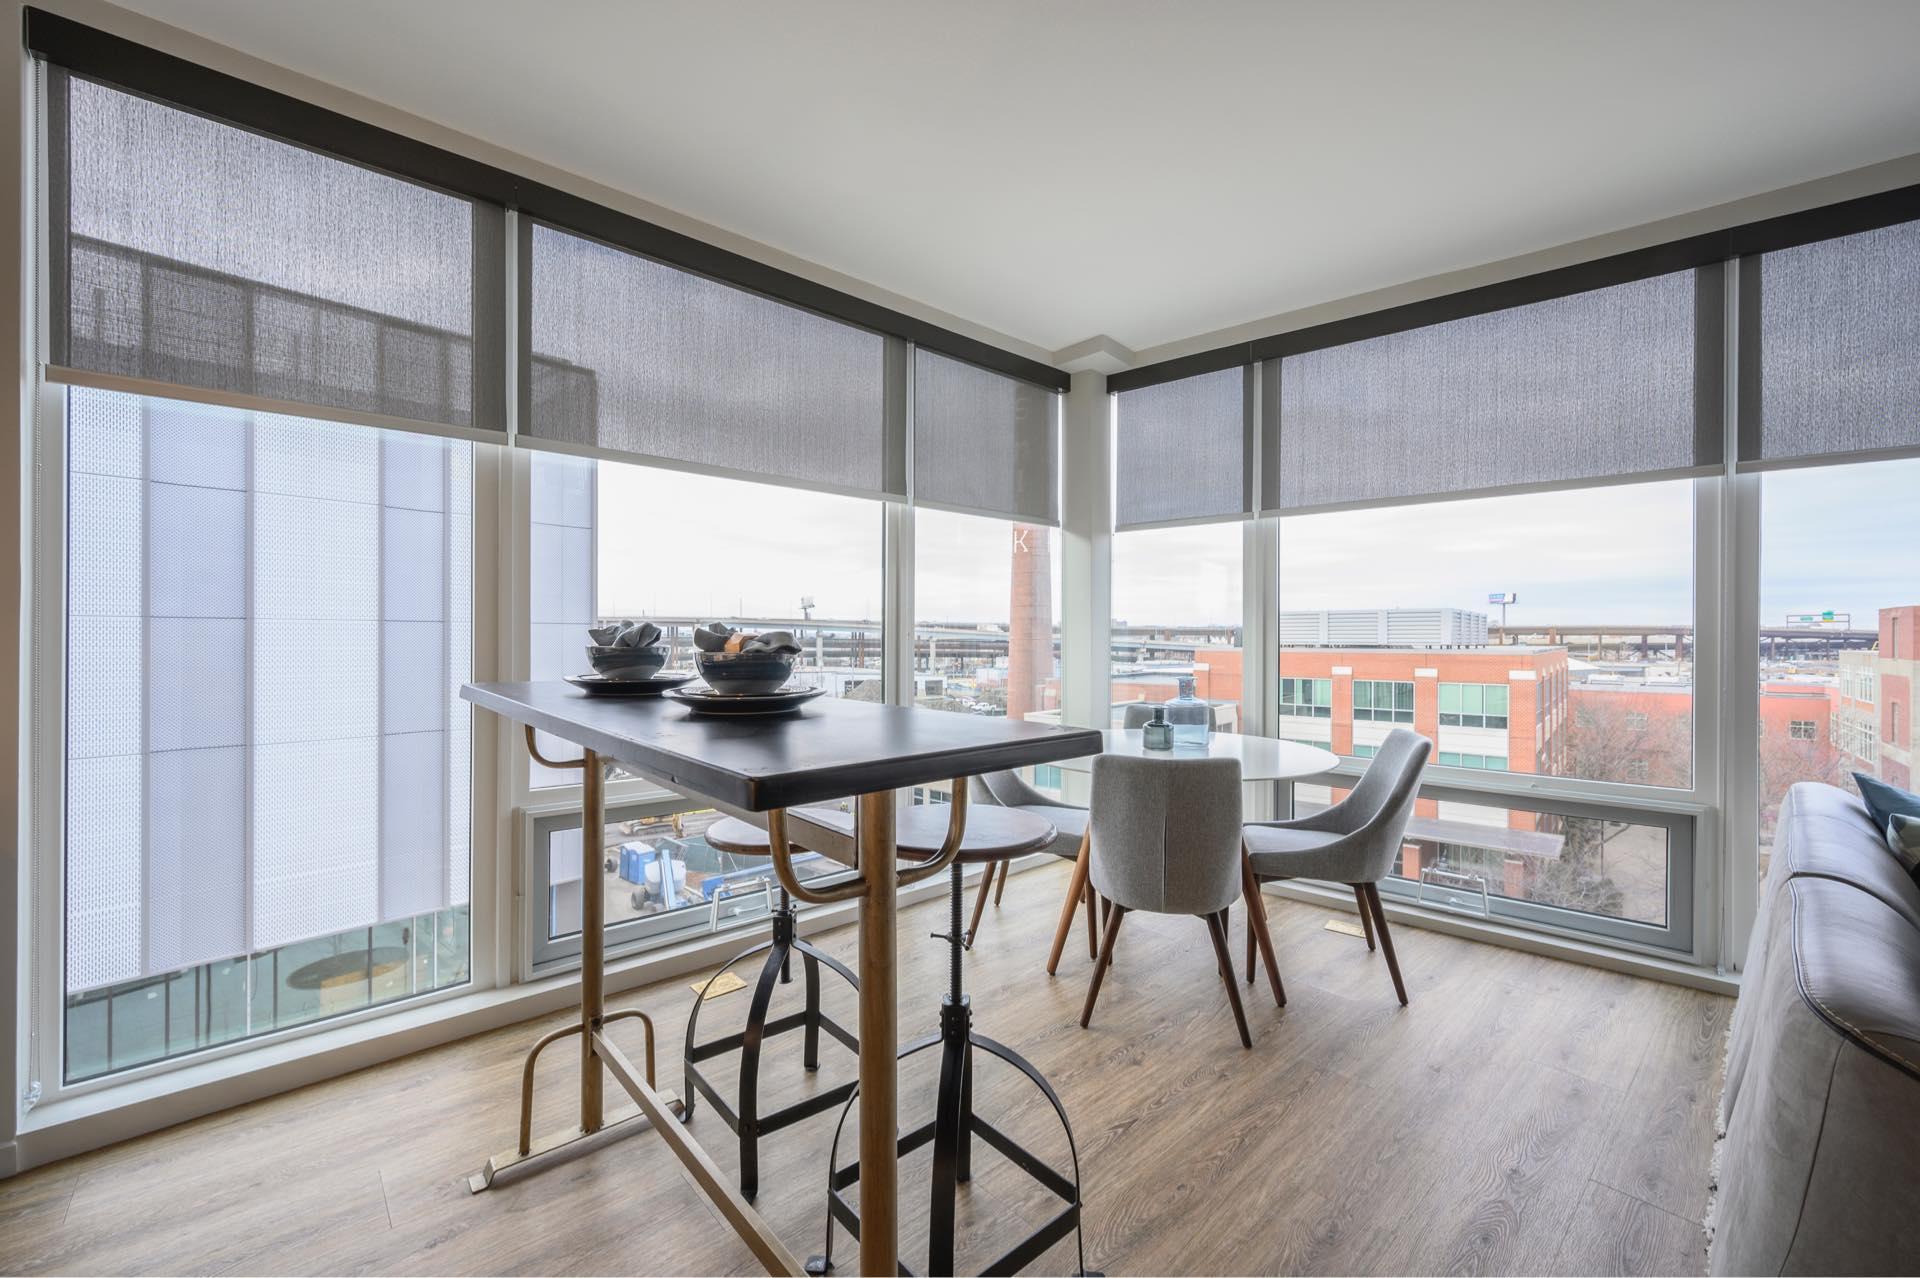 Apartments img 28